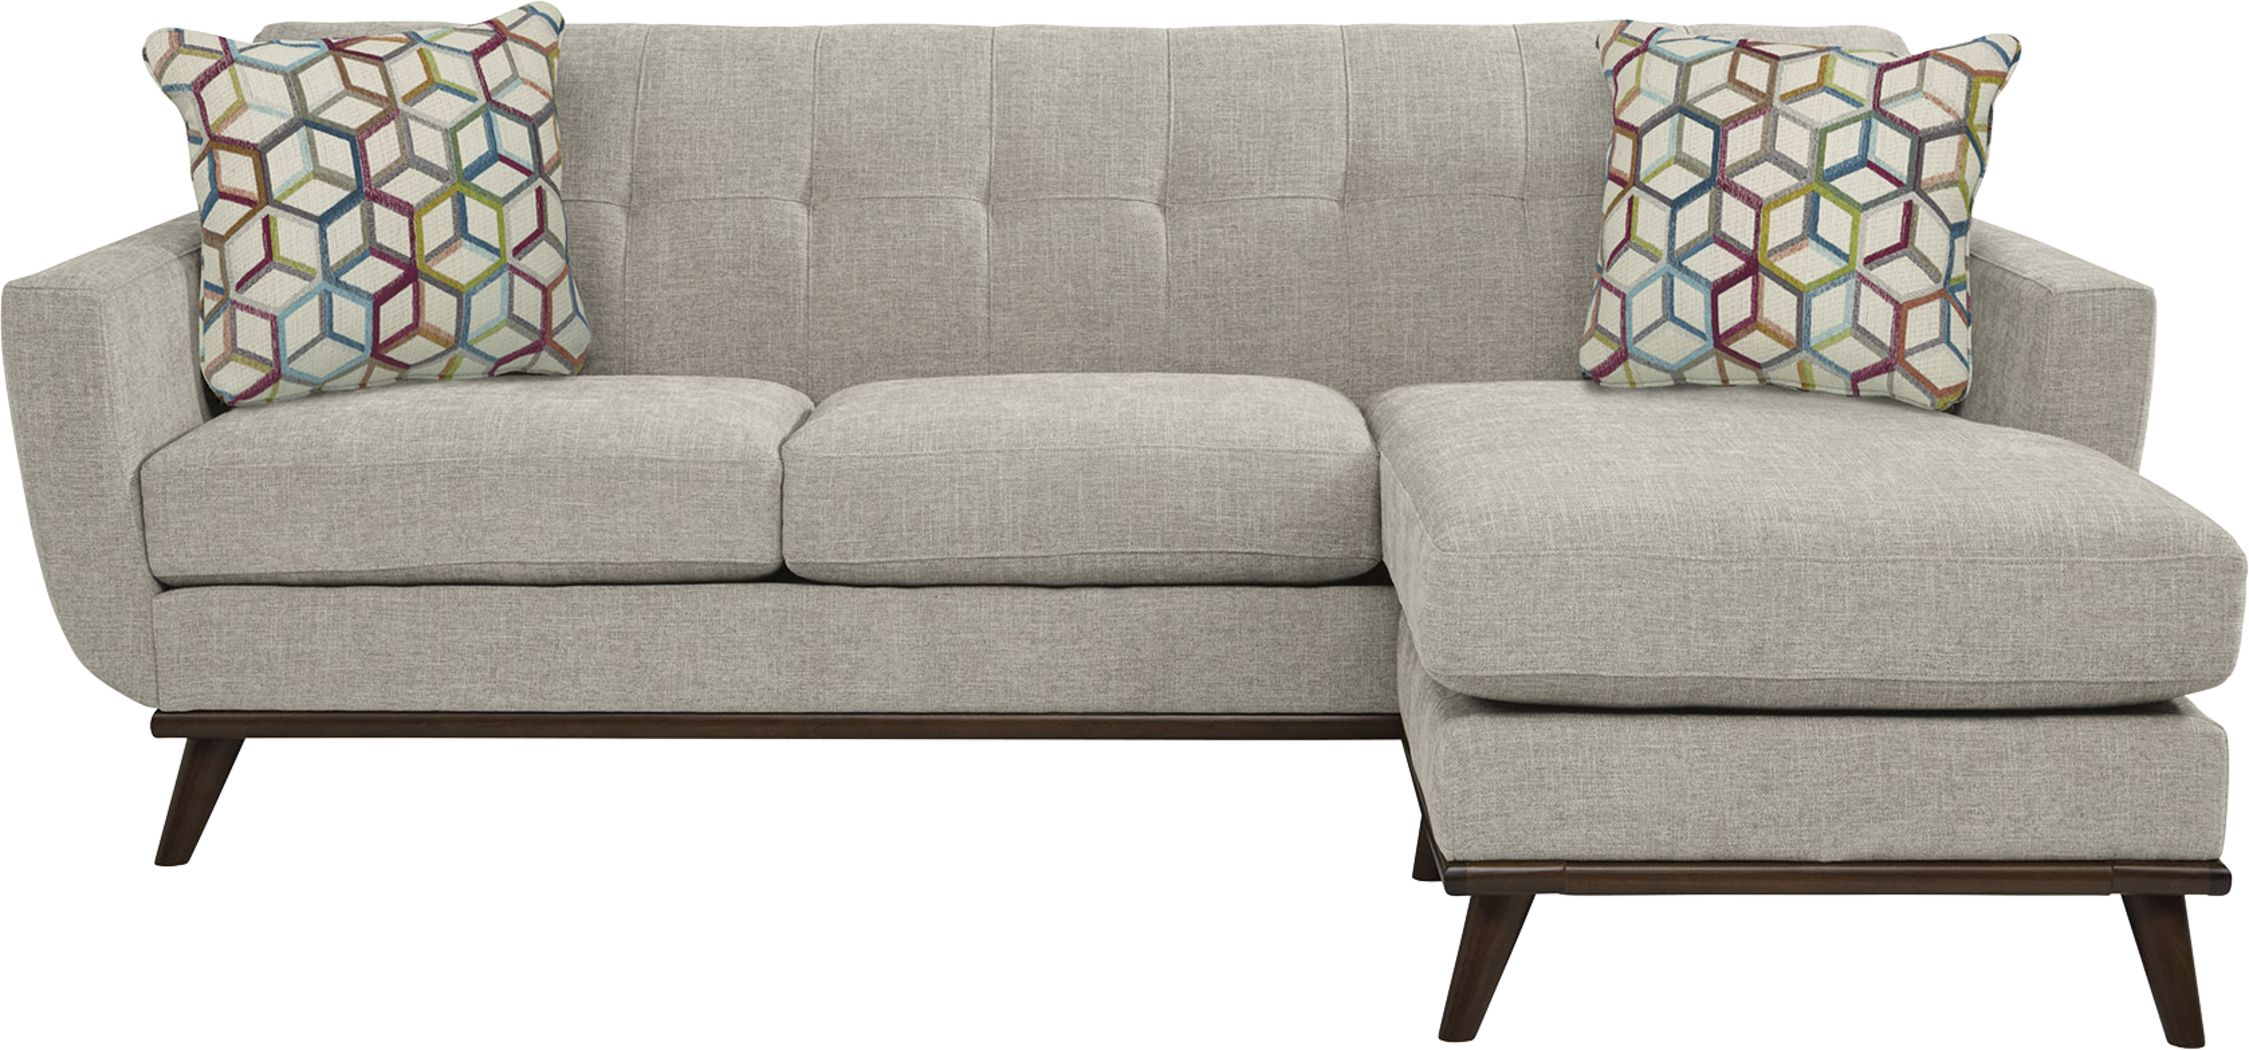 East Side Sand Chaise Sofa